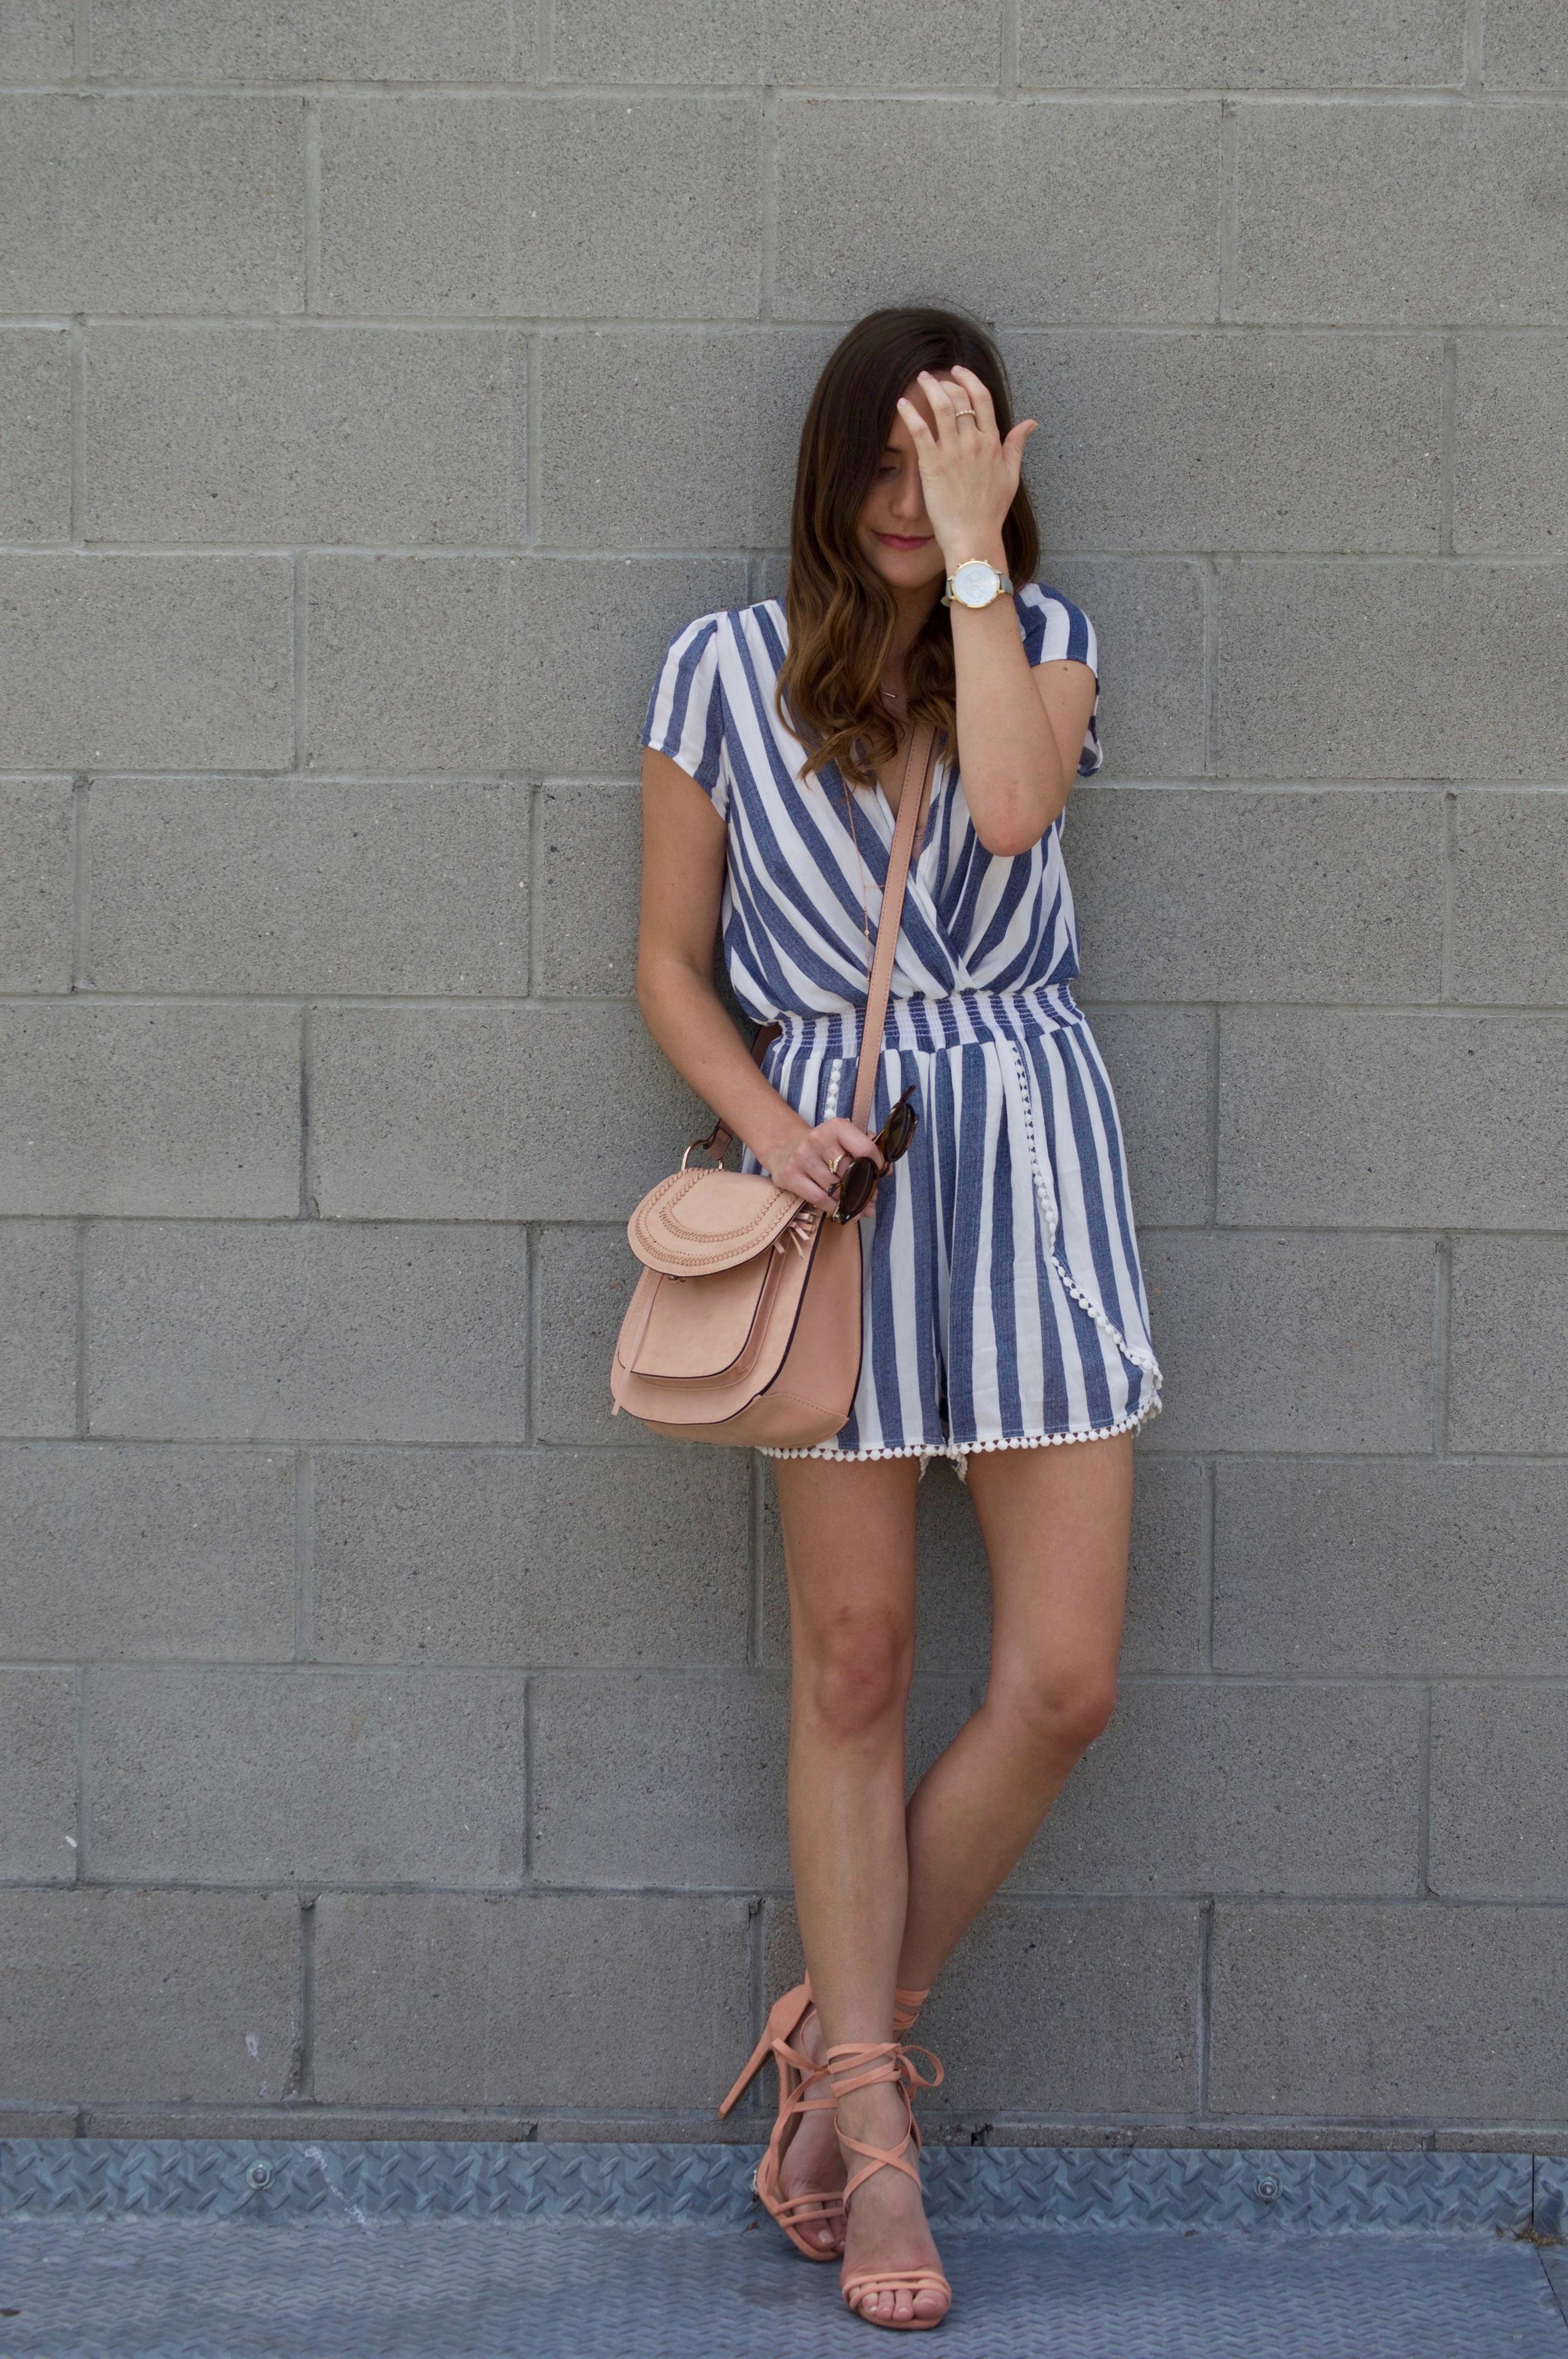 Shop the Look Below. Romper: c/o  J.Coda Clothing . Shoes: c/o  Make Me Chic . Bag: Franco Sarto via TJMaxx—similar below. Watch:  ILY Couture . Necklace:  Nordstrom . Rings: c/o  BaubleBar . Sunglasses:  Ray-Ban .